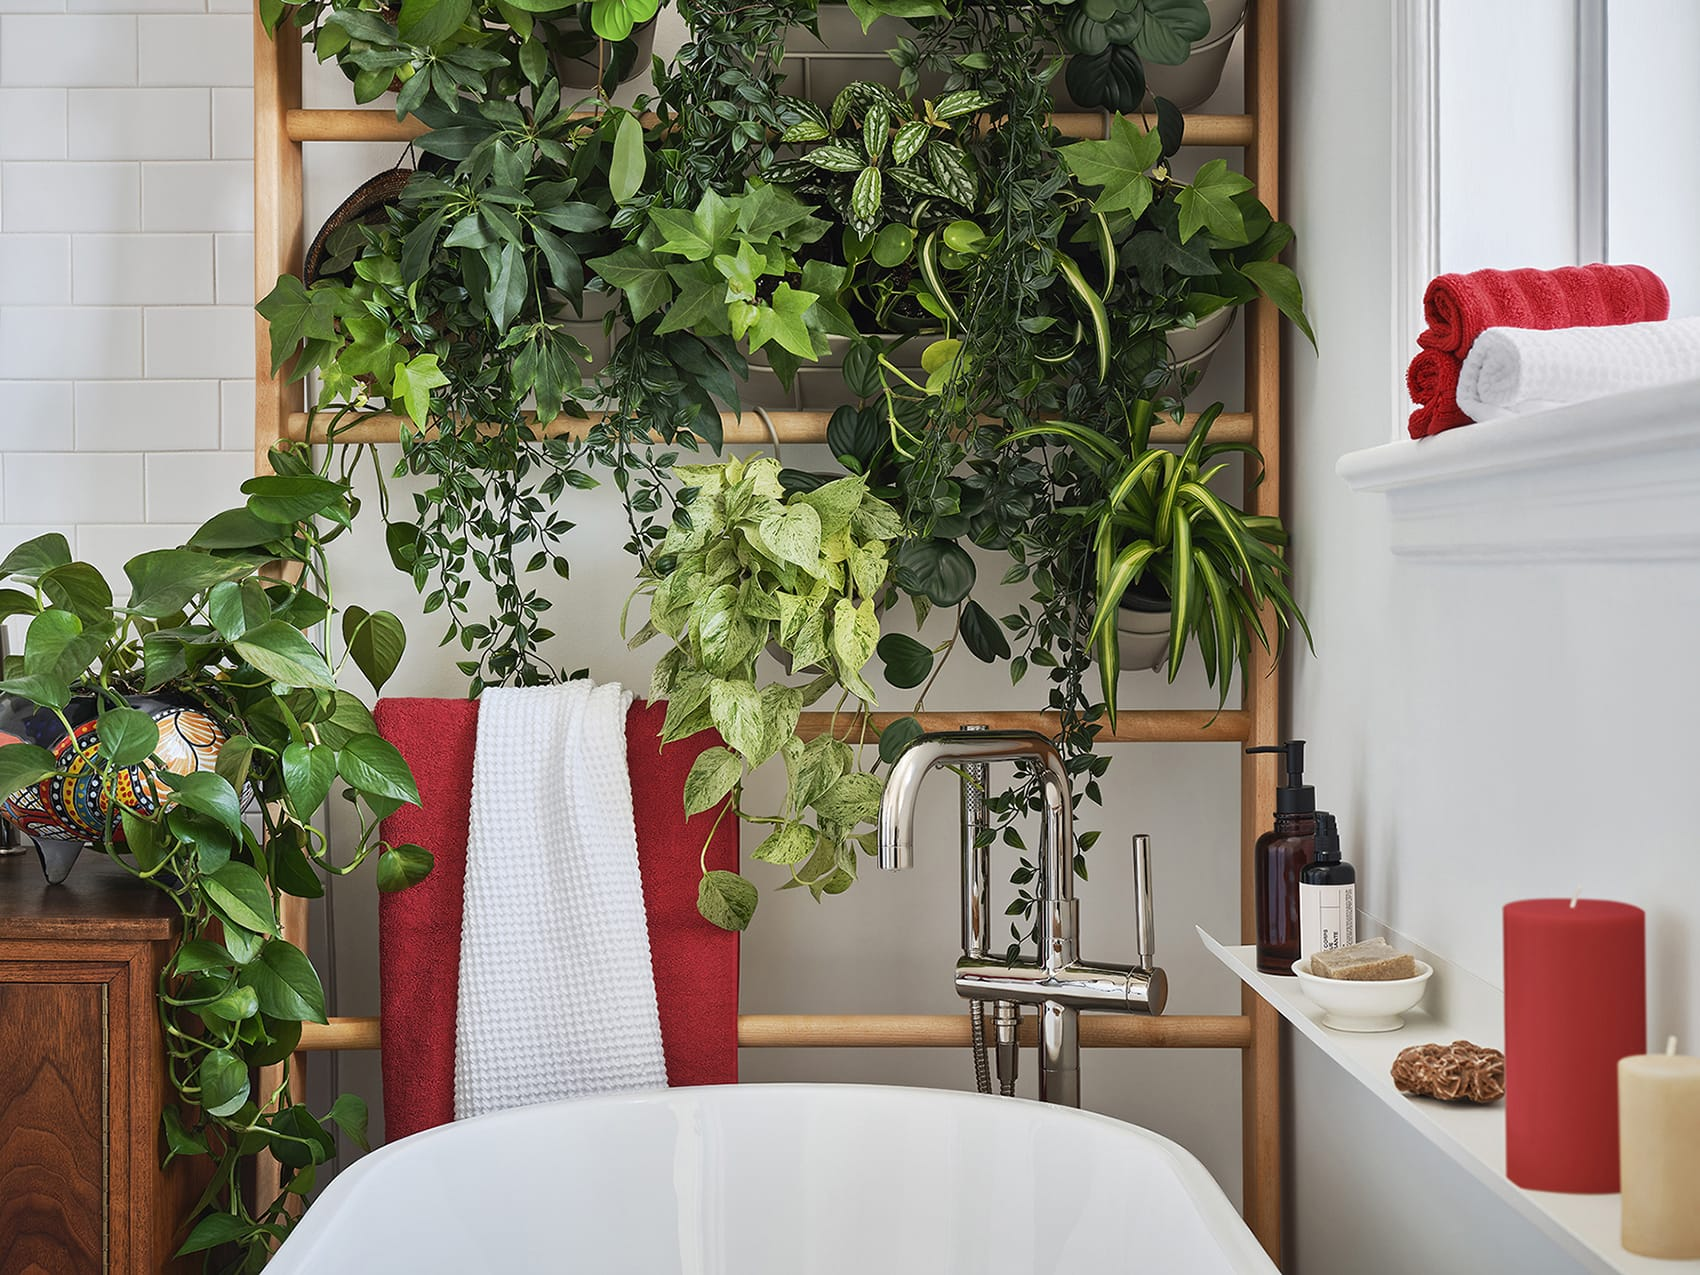 Jardin vertical plantes de salle de bain